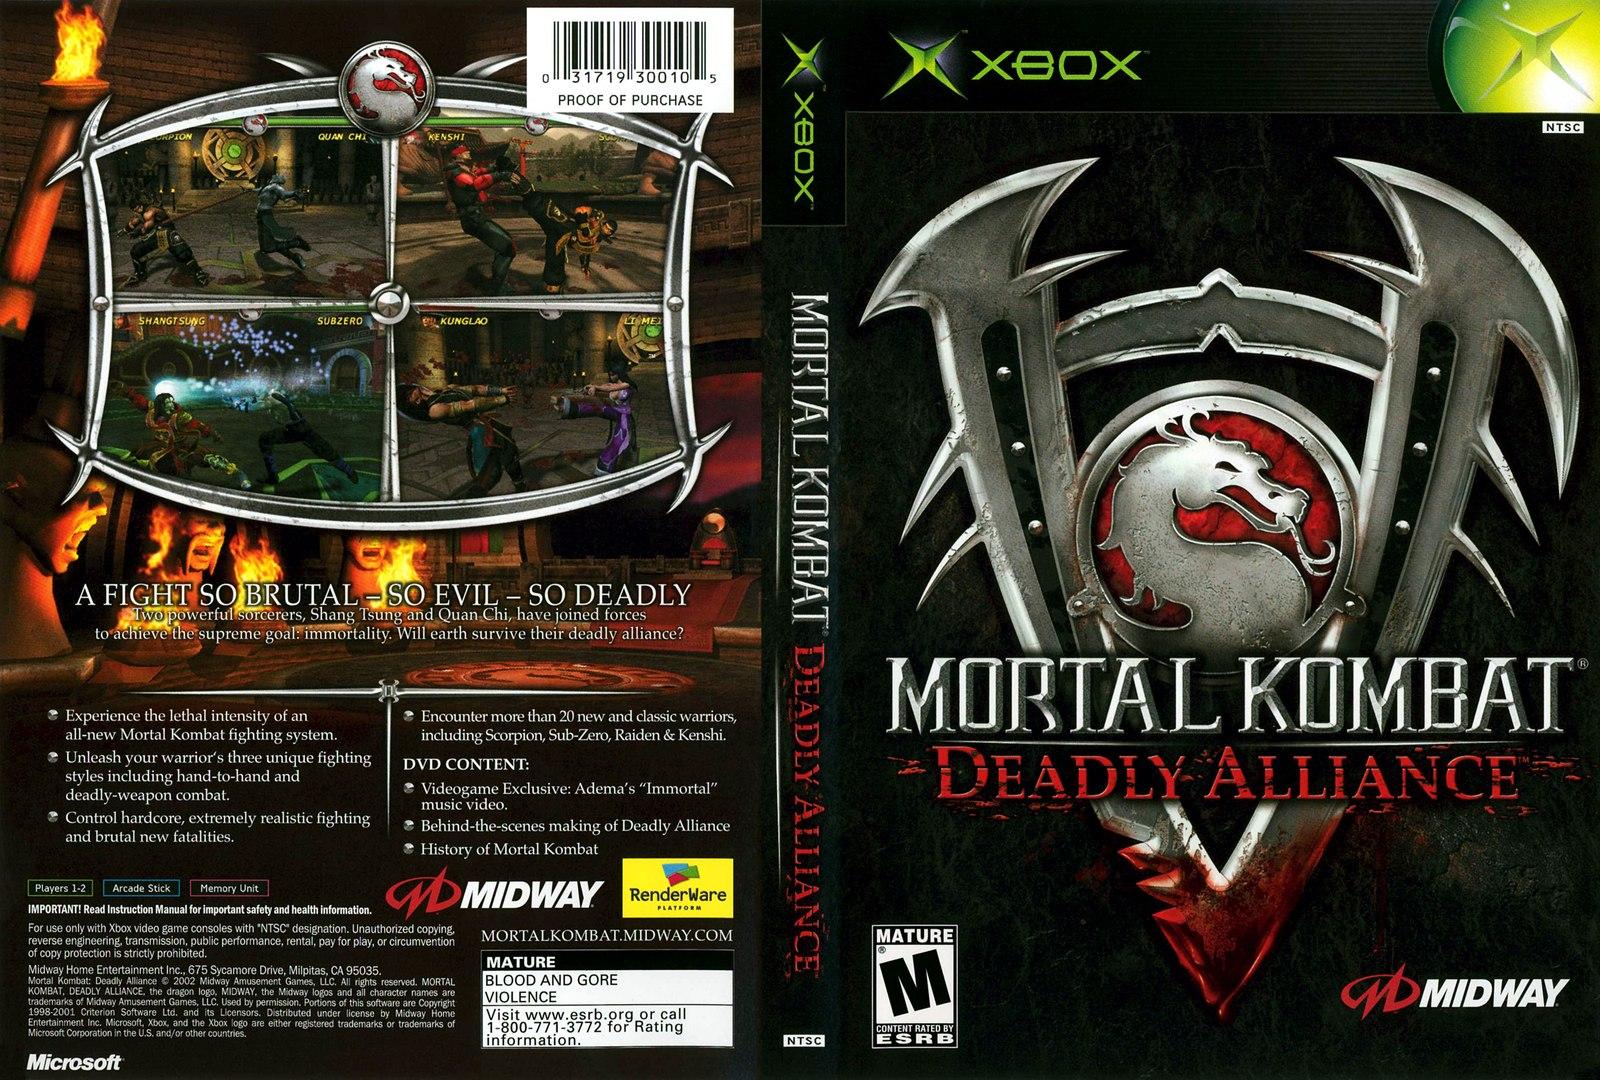 Mortal Kombat games - Mortal Kombat: Deadly Alliance and Mortal Kombat:  Tournament Edition